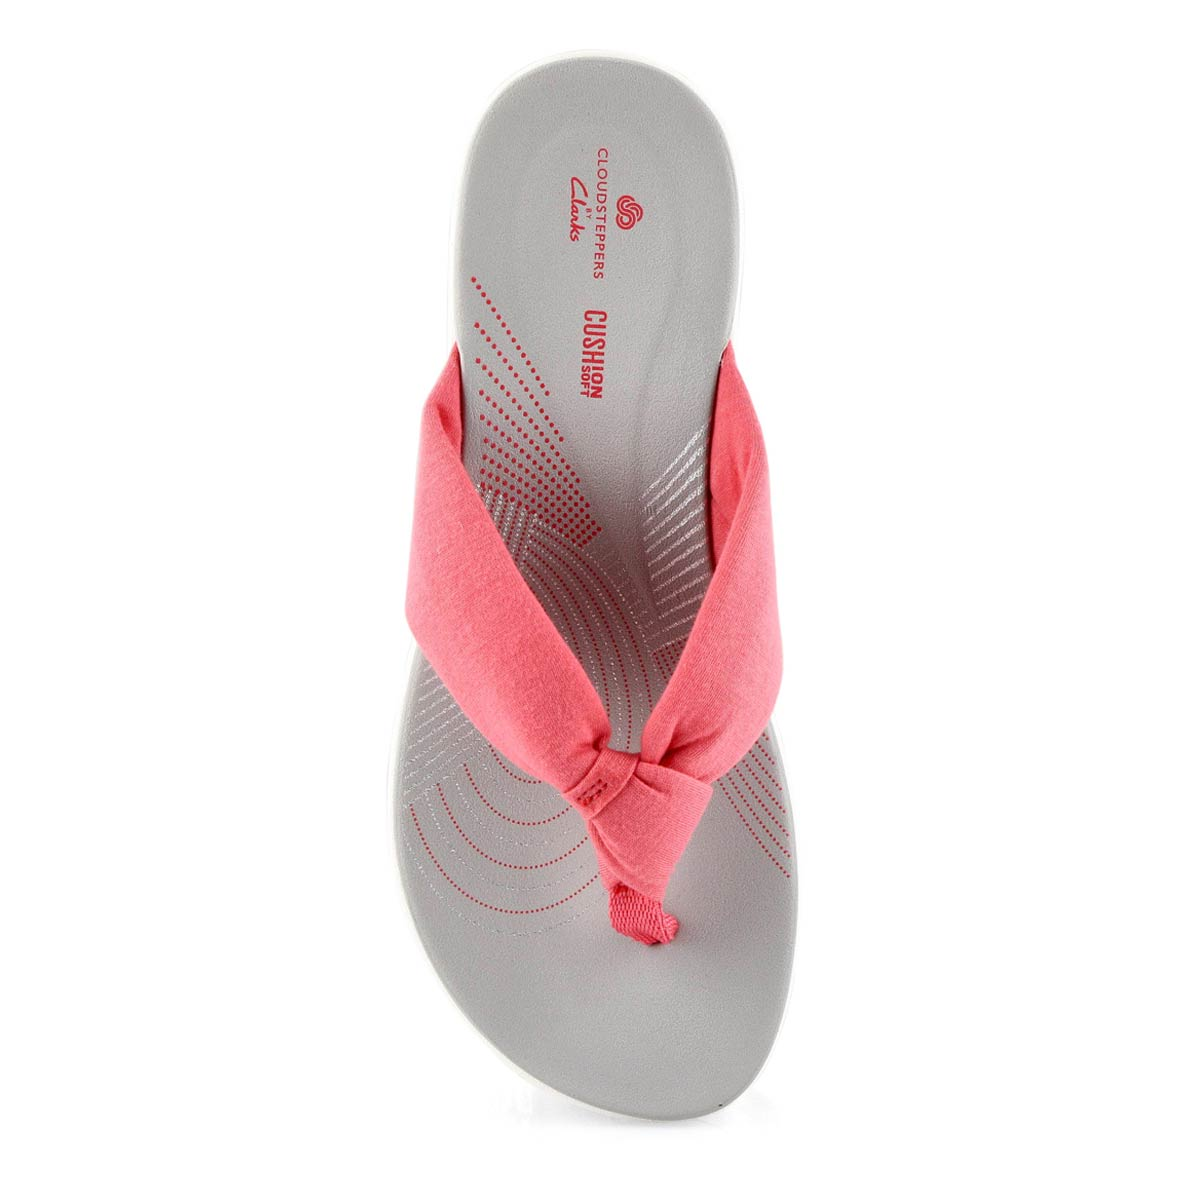 Lds Arla Glison berry thong wedge sandal